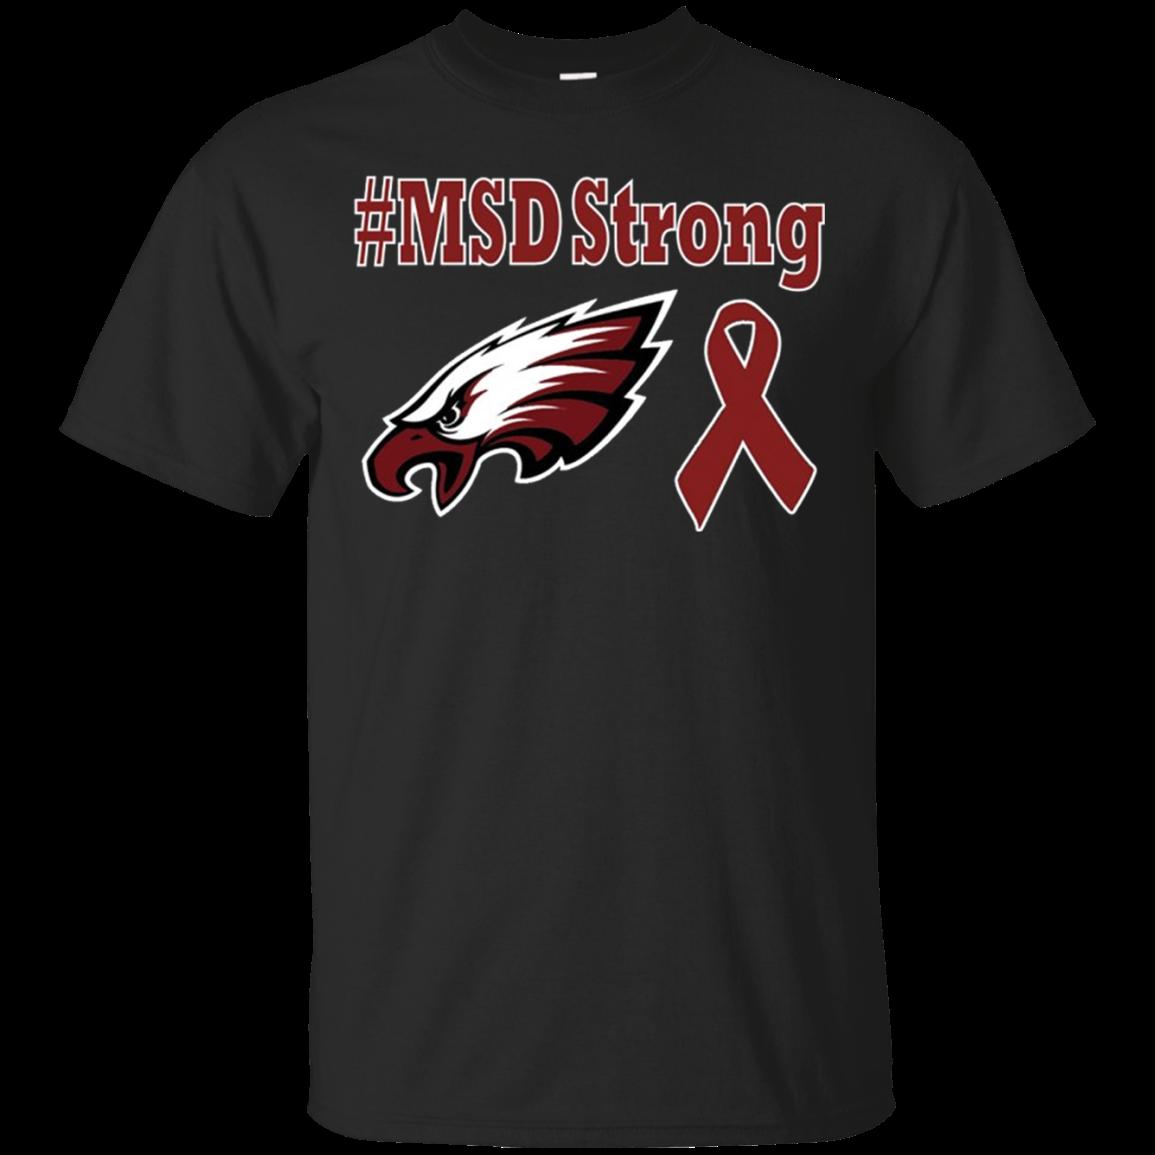 #MSD Strong - Marjory Stoneman Douglas High School T shirt Hoodie Sweater Men